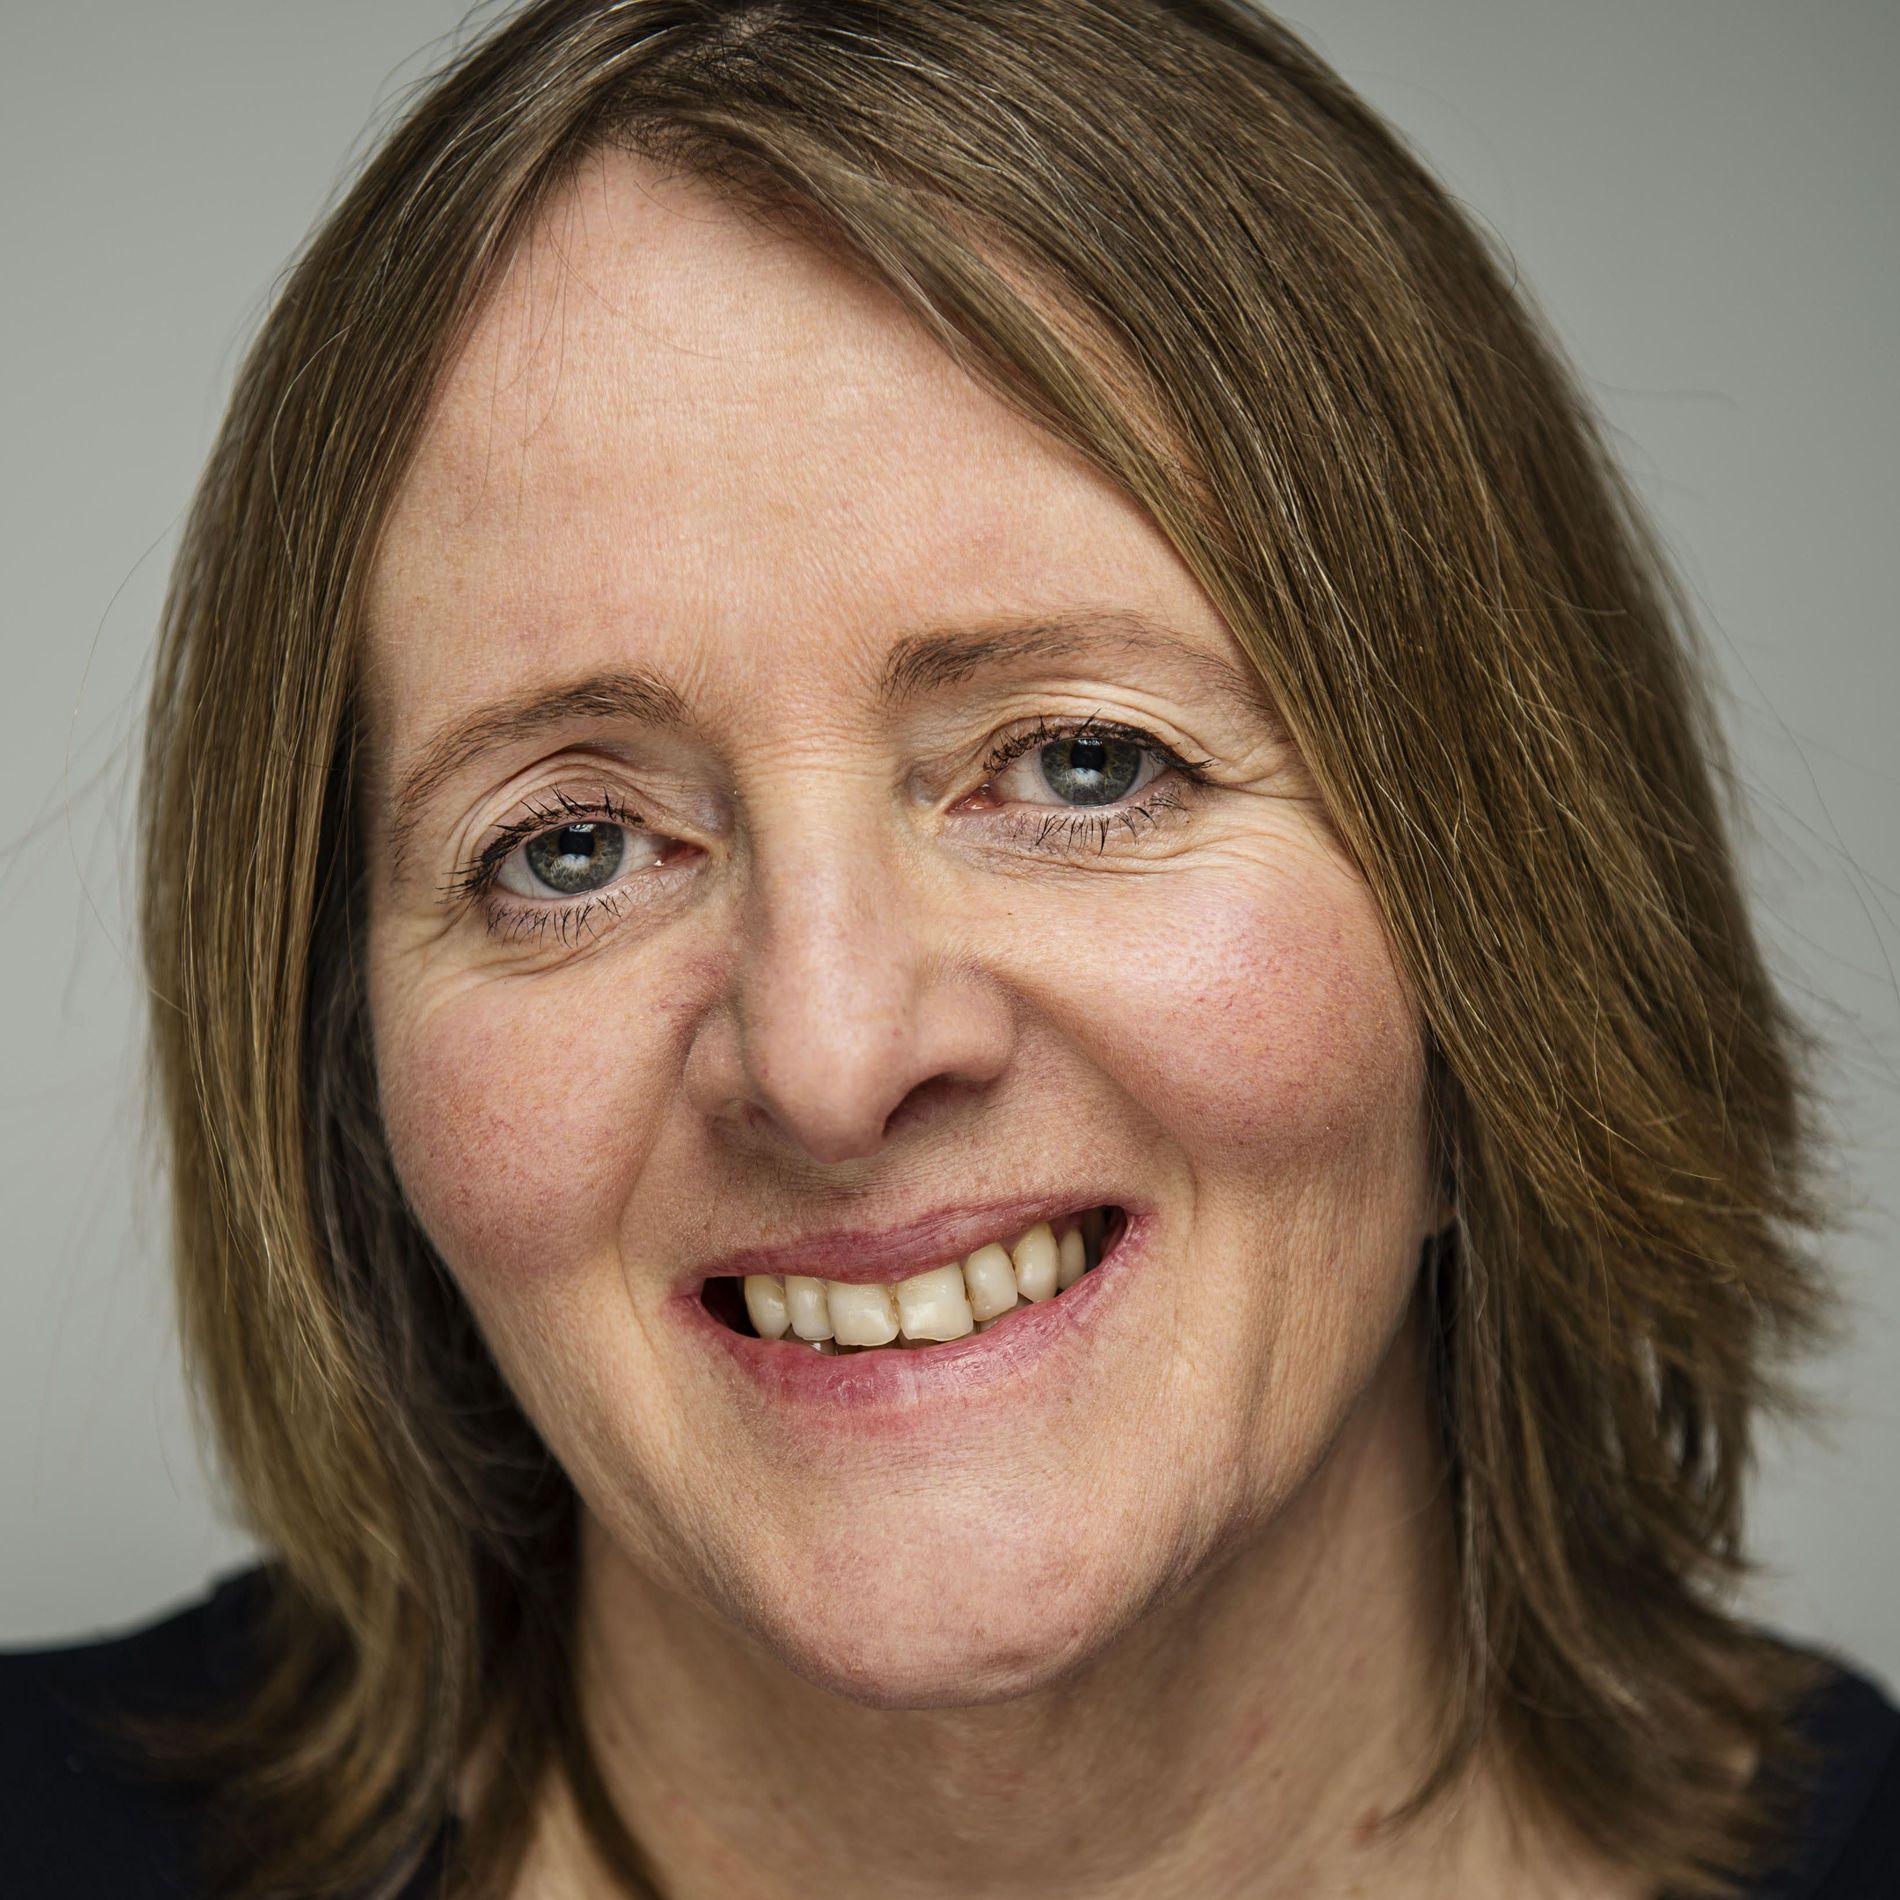 Anne Birgitta Nilsen